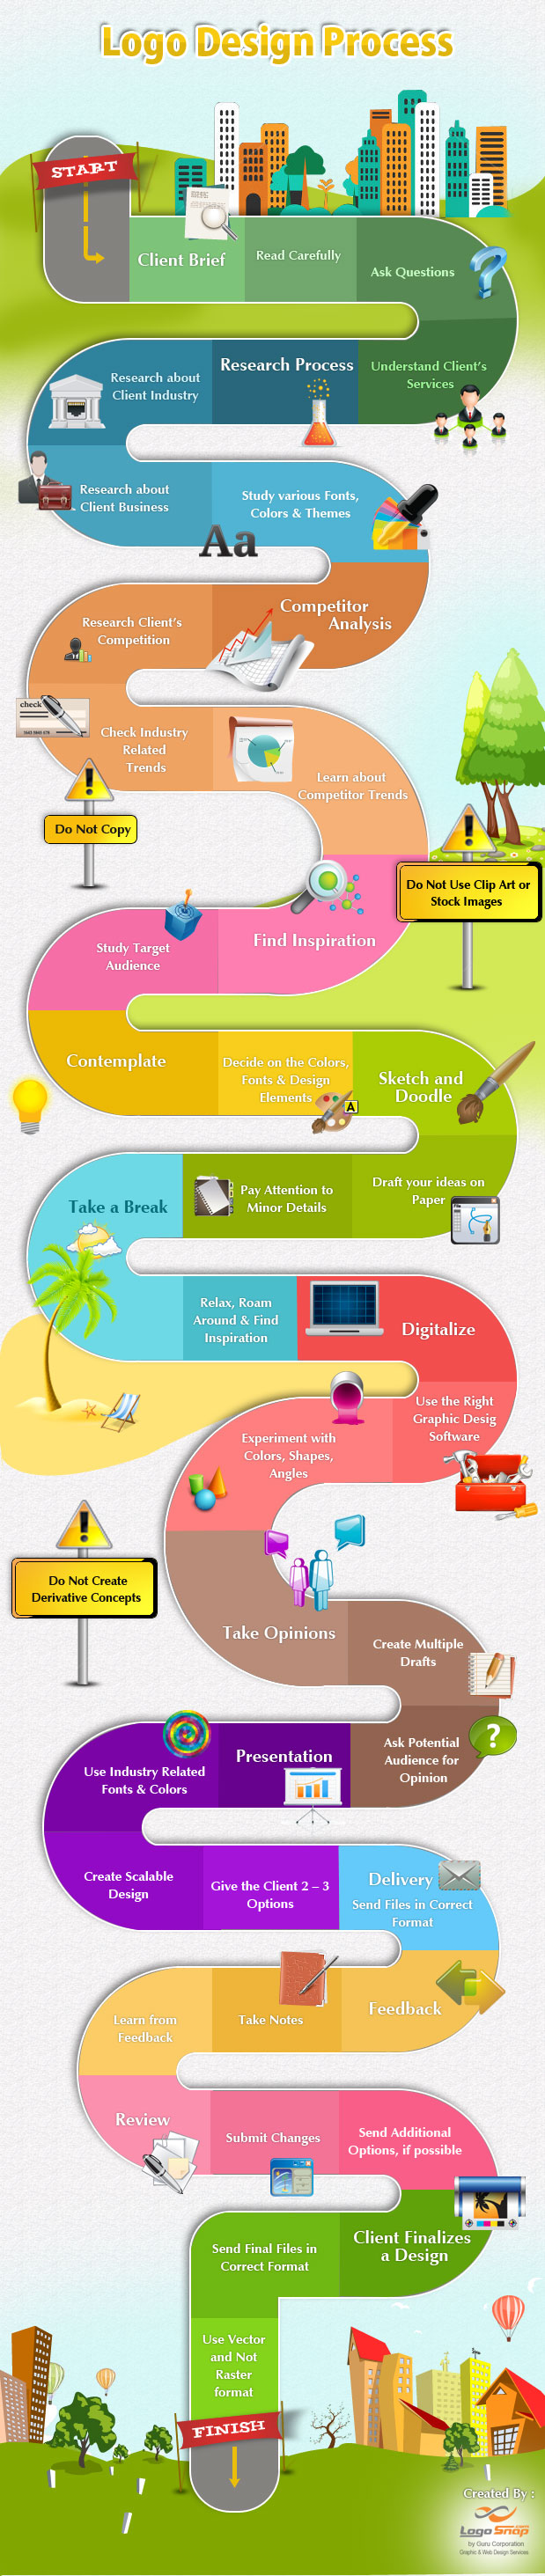 Design-process-infographic